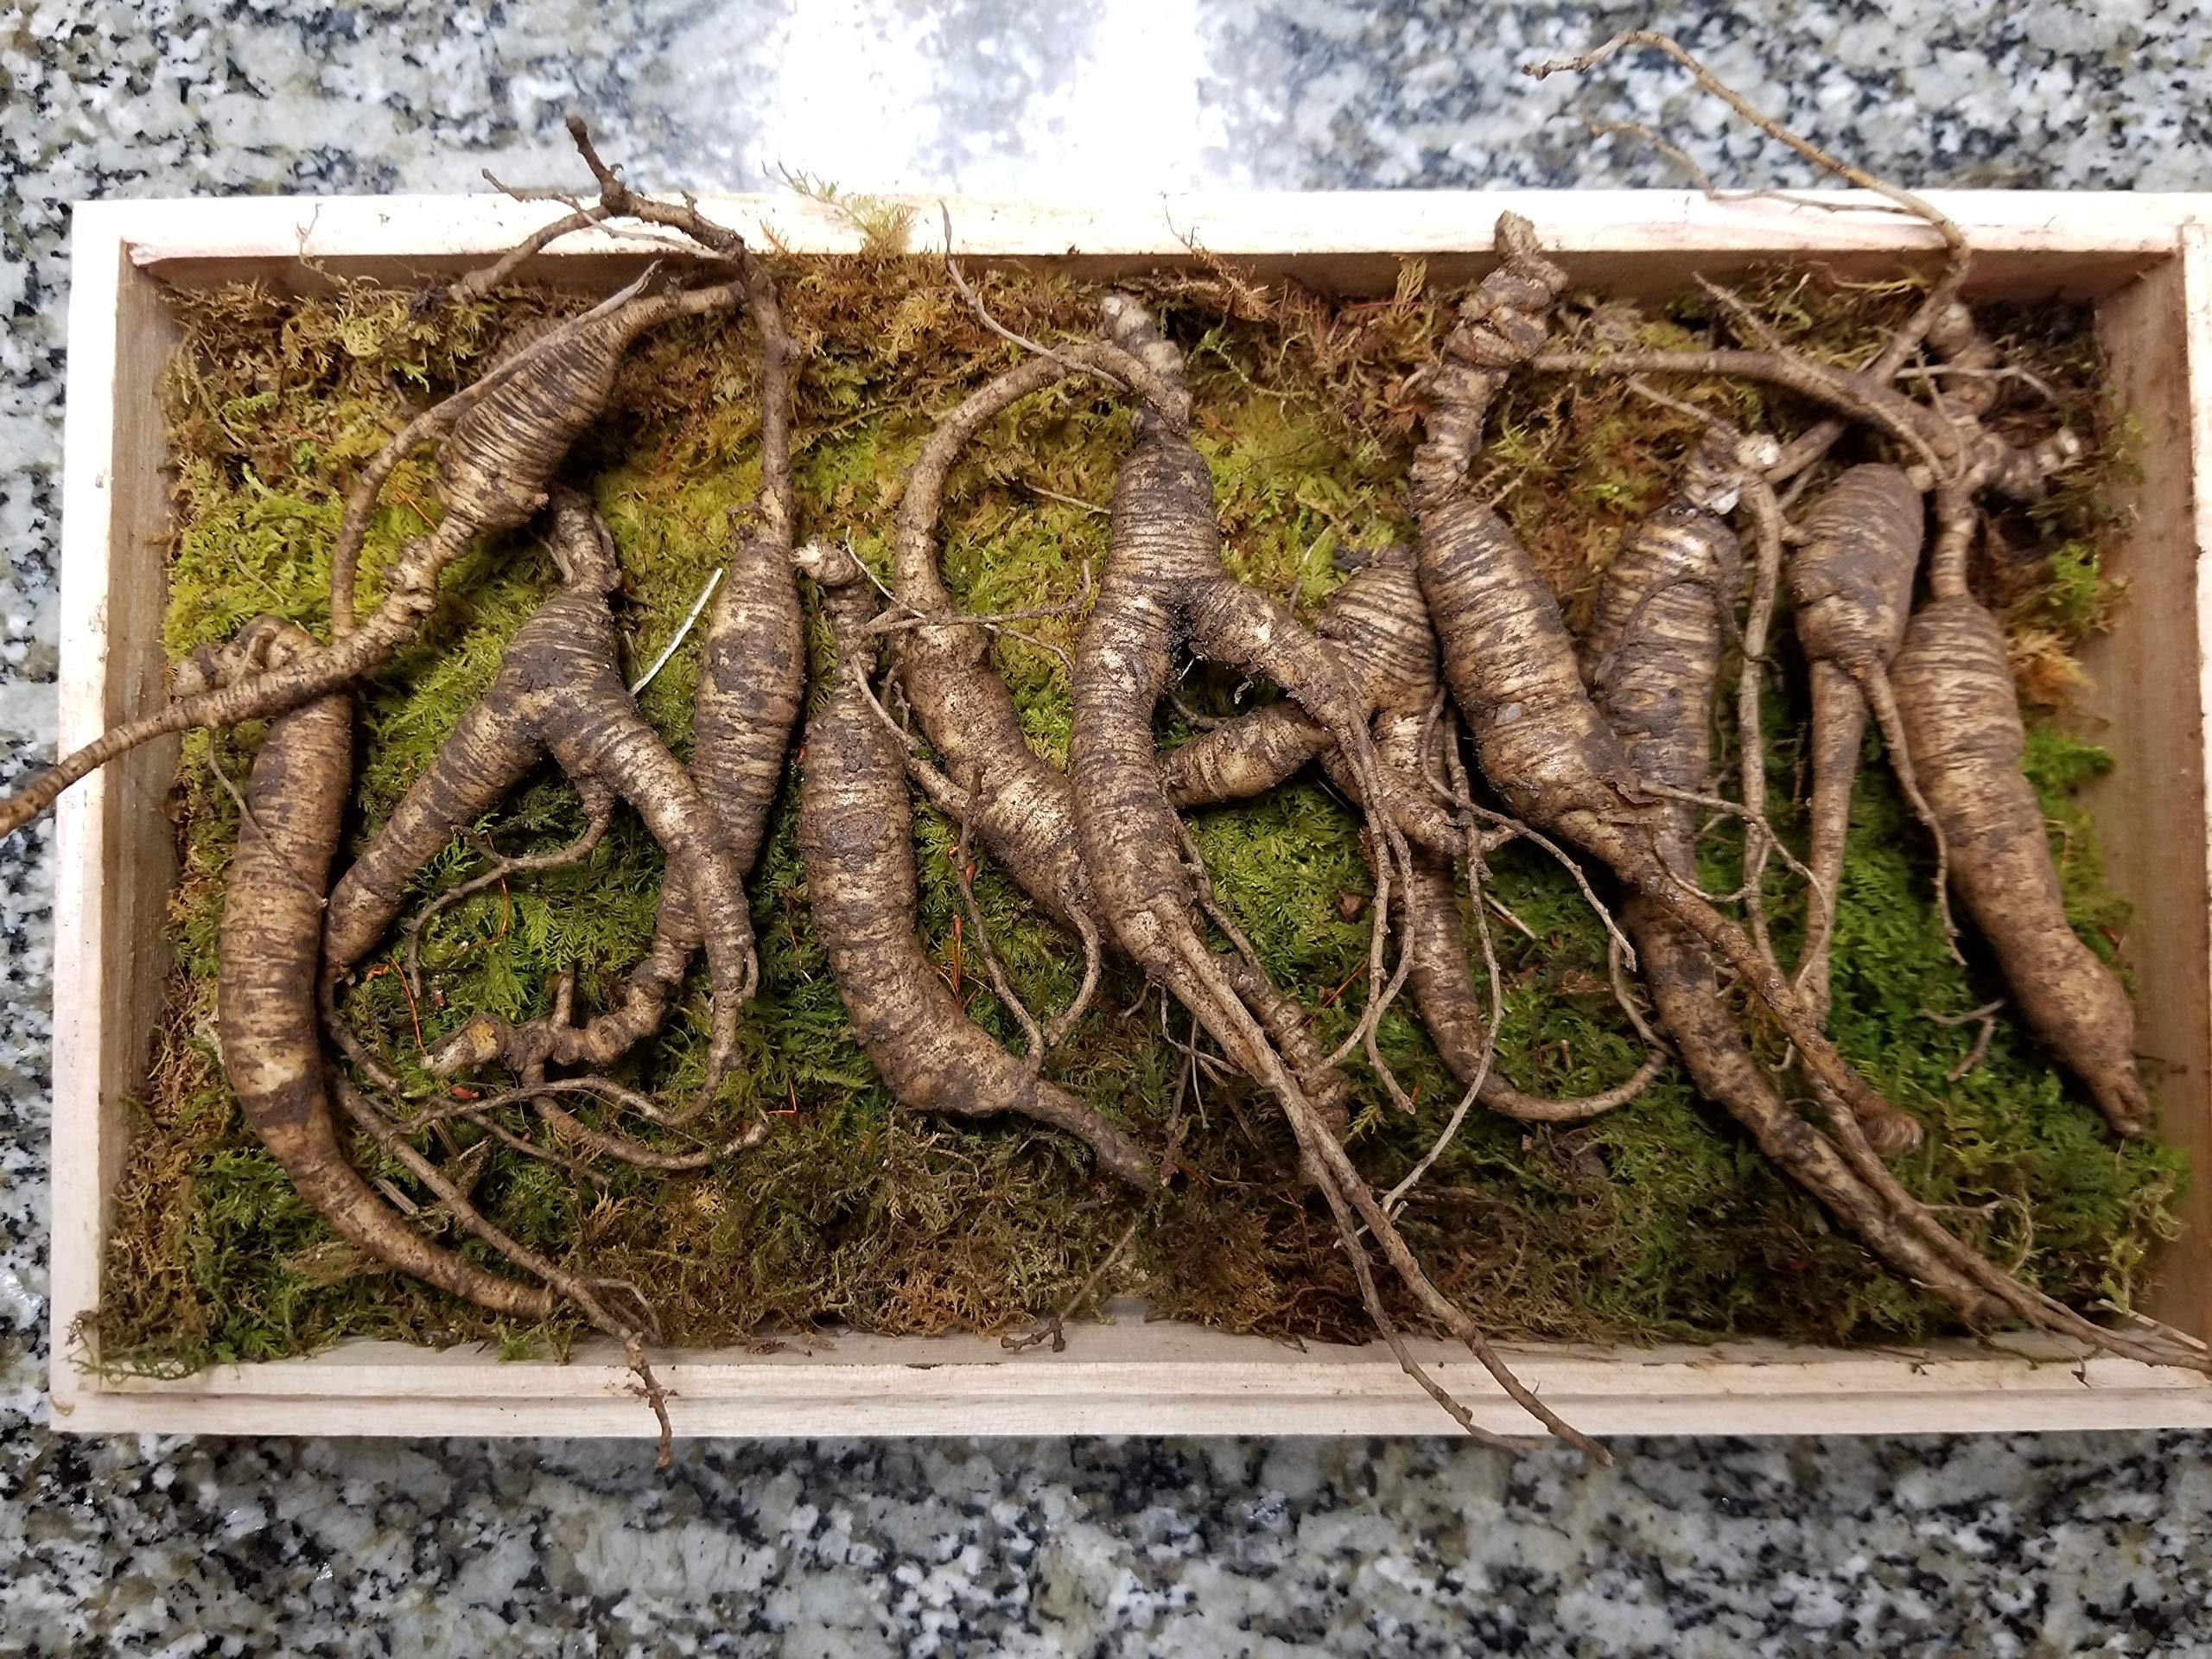 American Wild Ginseng Appalachian Mountain PANAX 100% Natural Organic Fresh Wild Ginseng Root Gift Pack (30~40 Years Old, 65 Gram) King of Saponin!